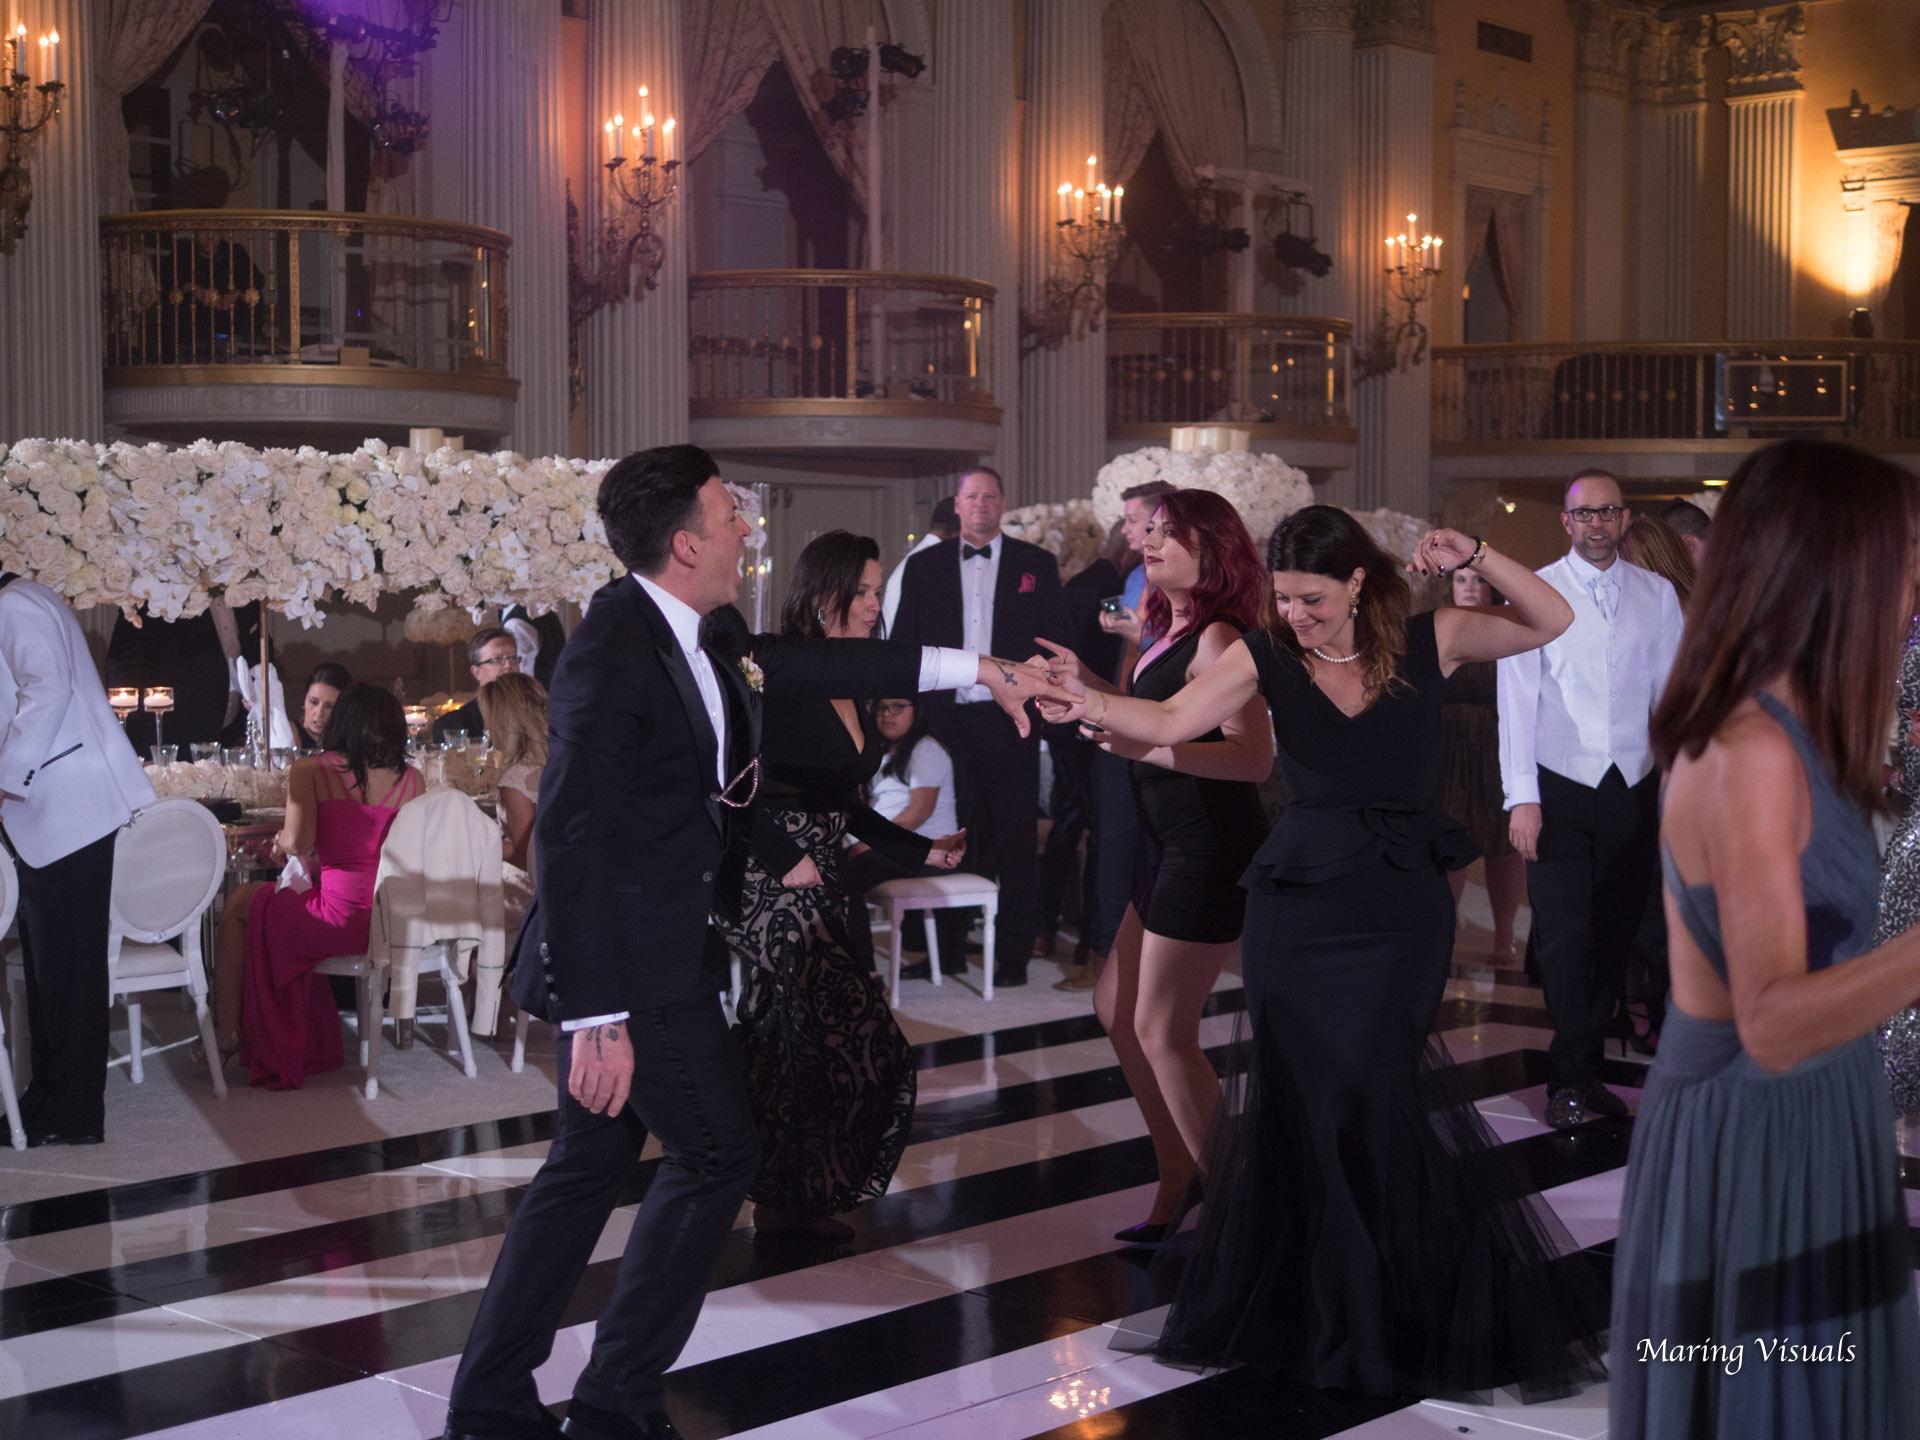 David Tutera Weddings by Maring Visuals 00582.jpg